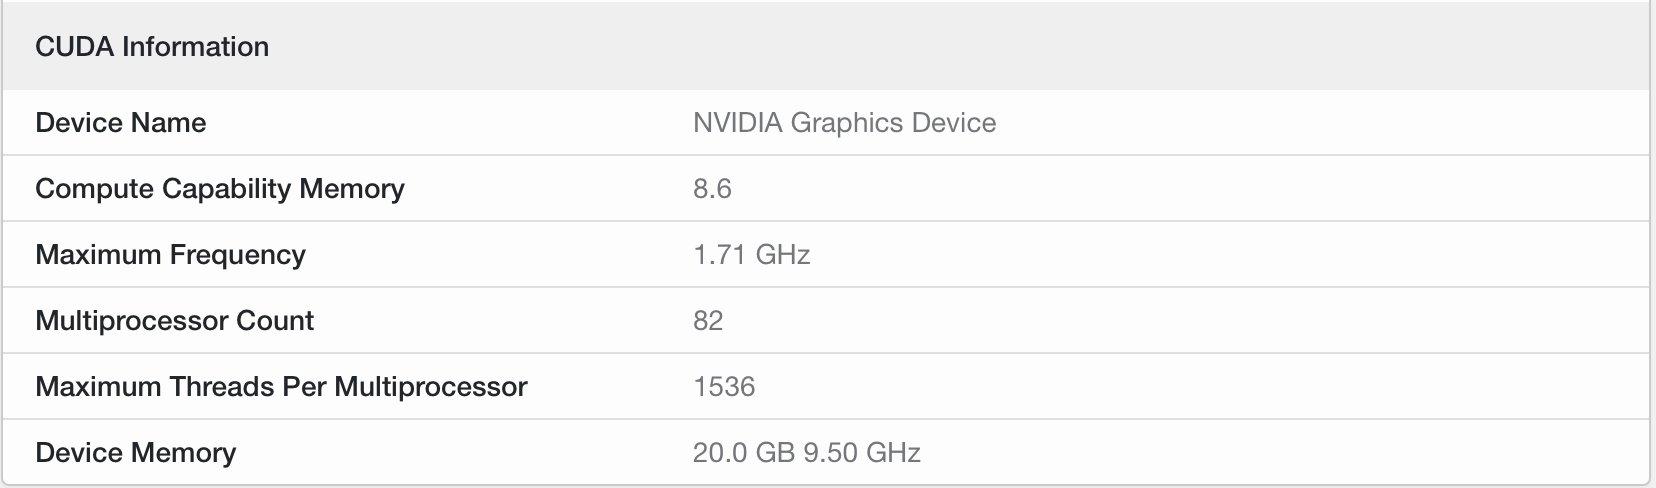 Posibles características del nueva GPU de Nvidia